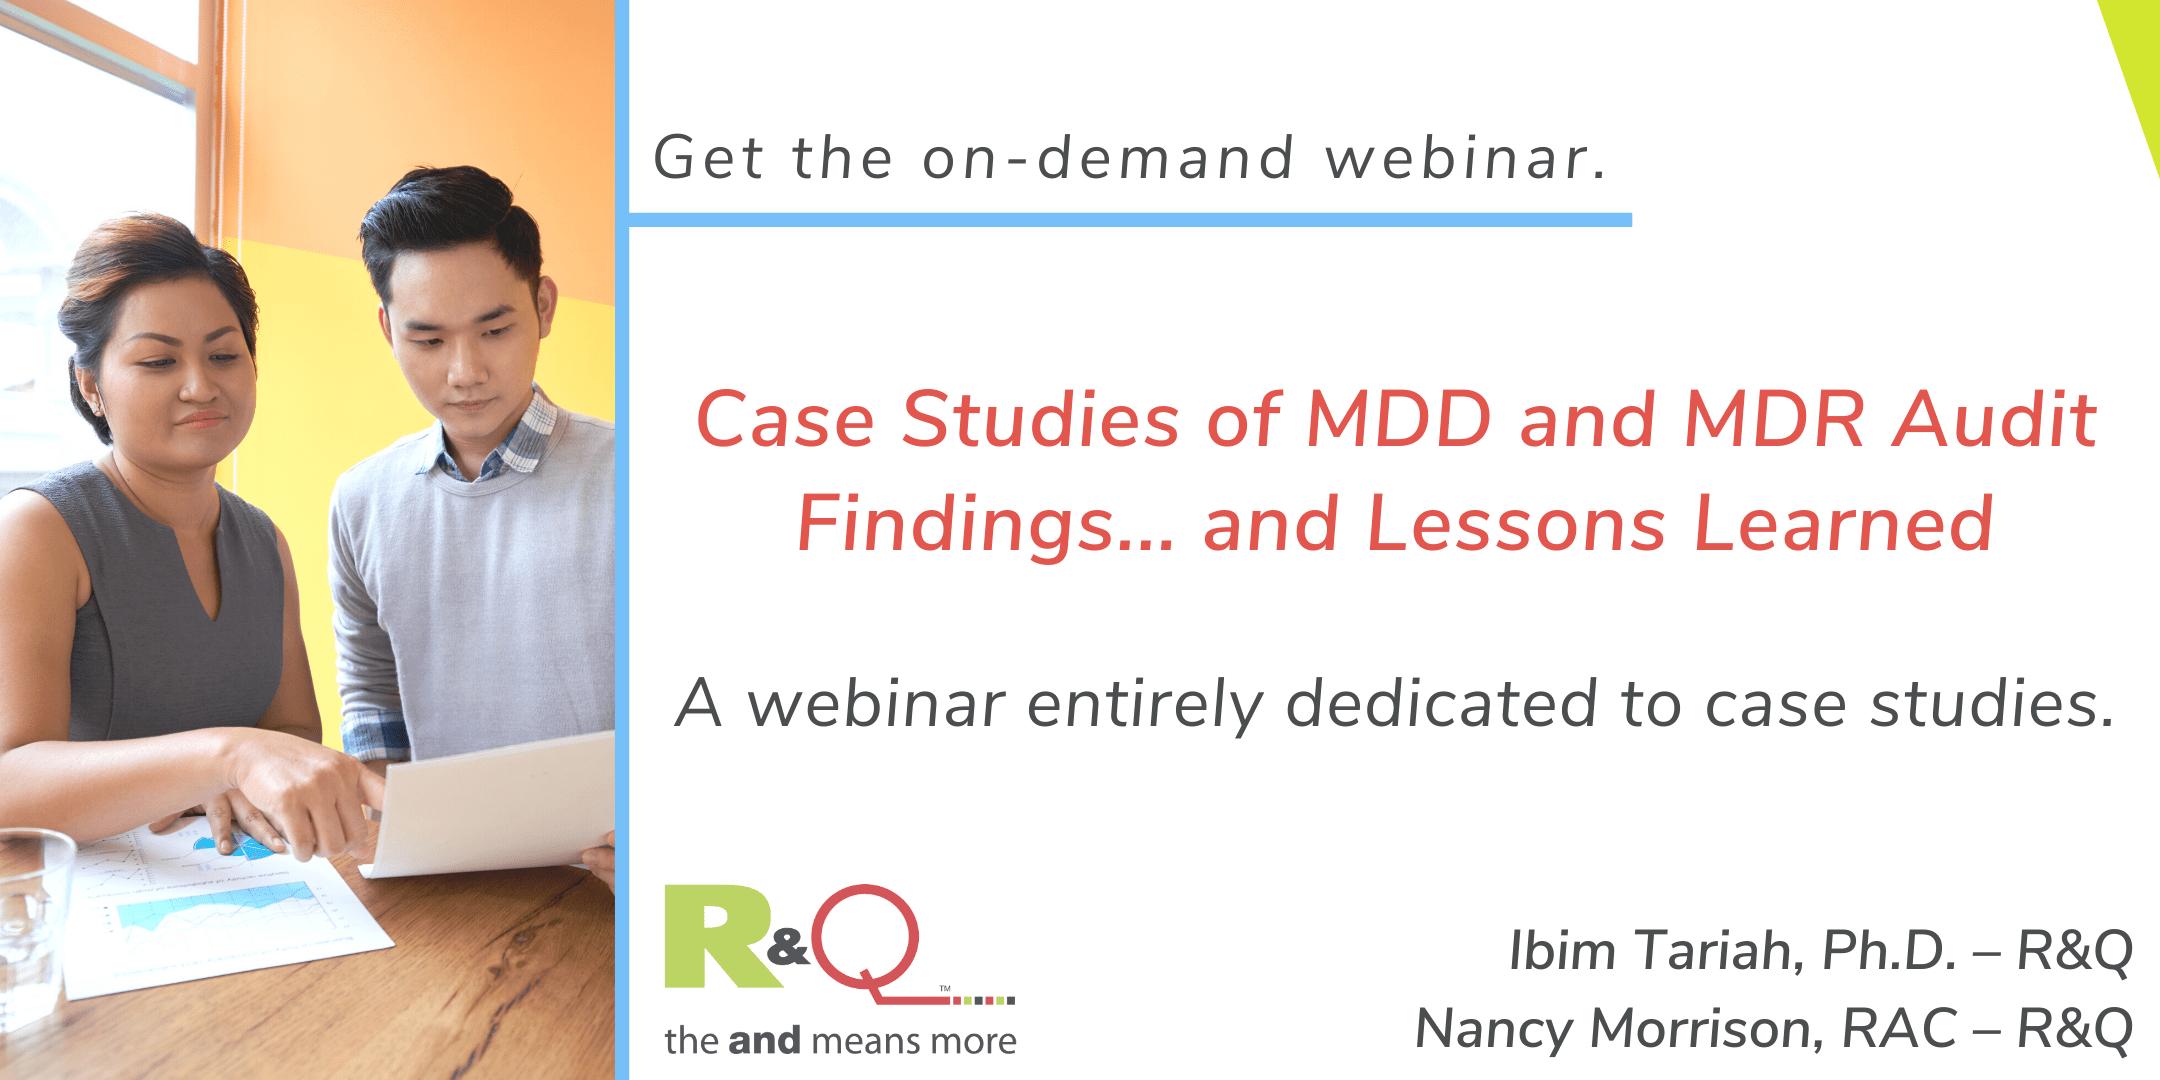 RQ_WB_Case_Studies_MDD_MDR_Audits_On_Demand_Promo-min